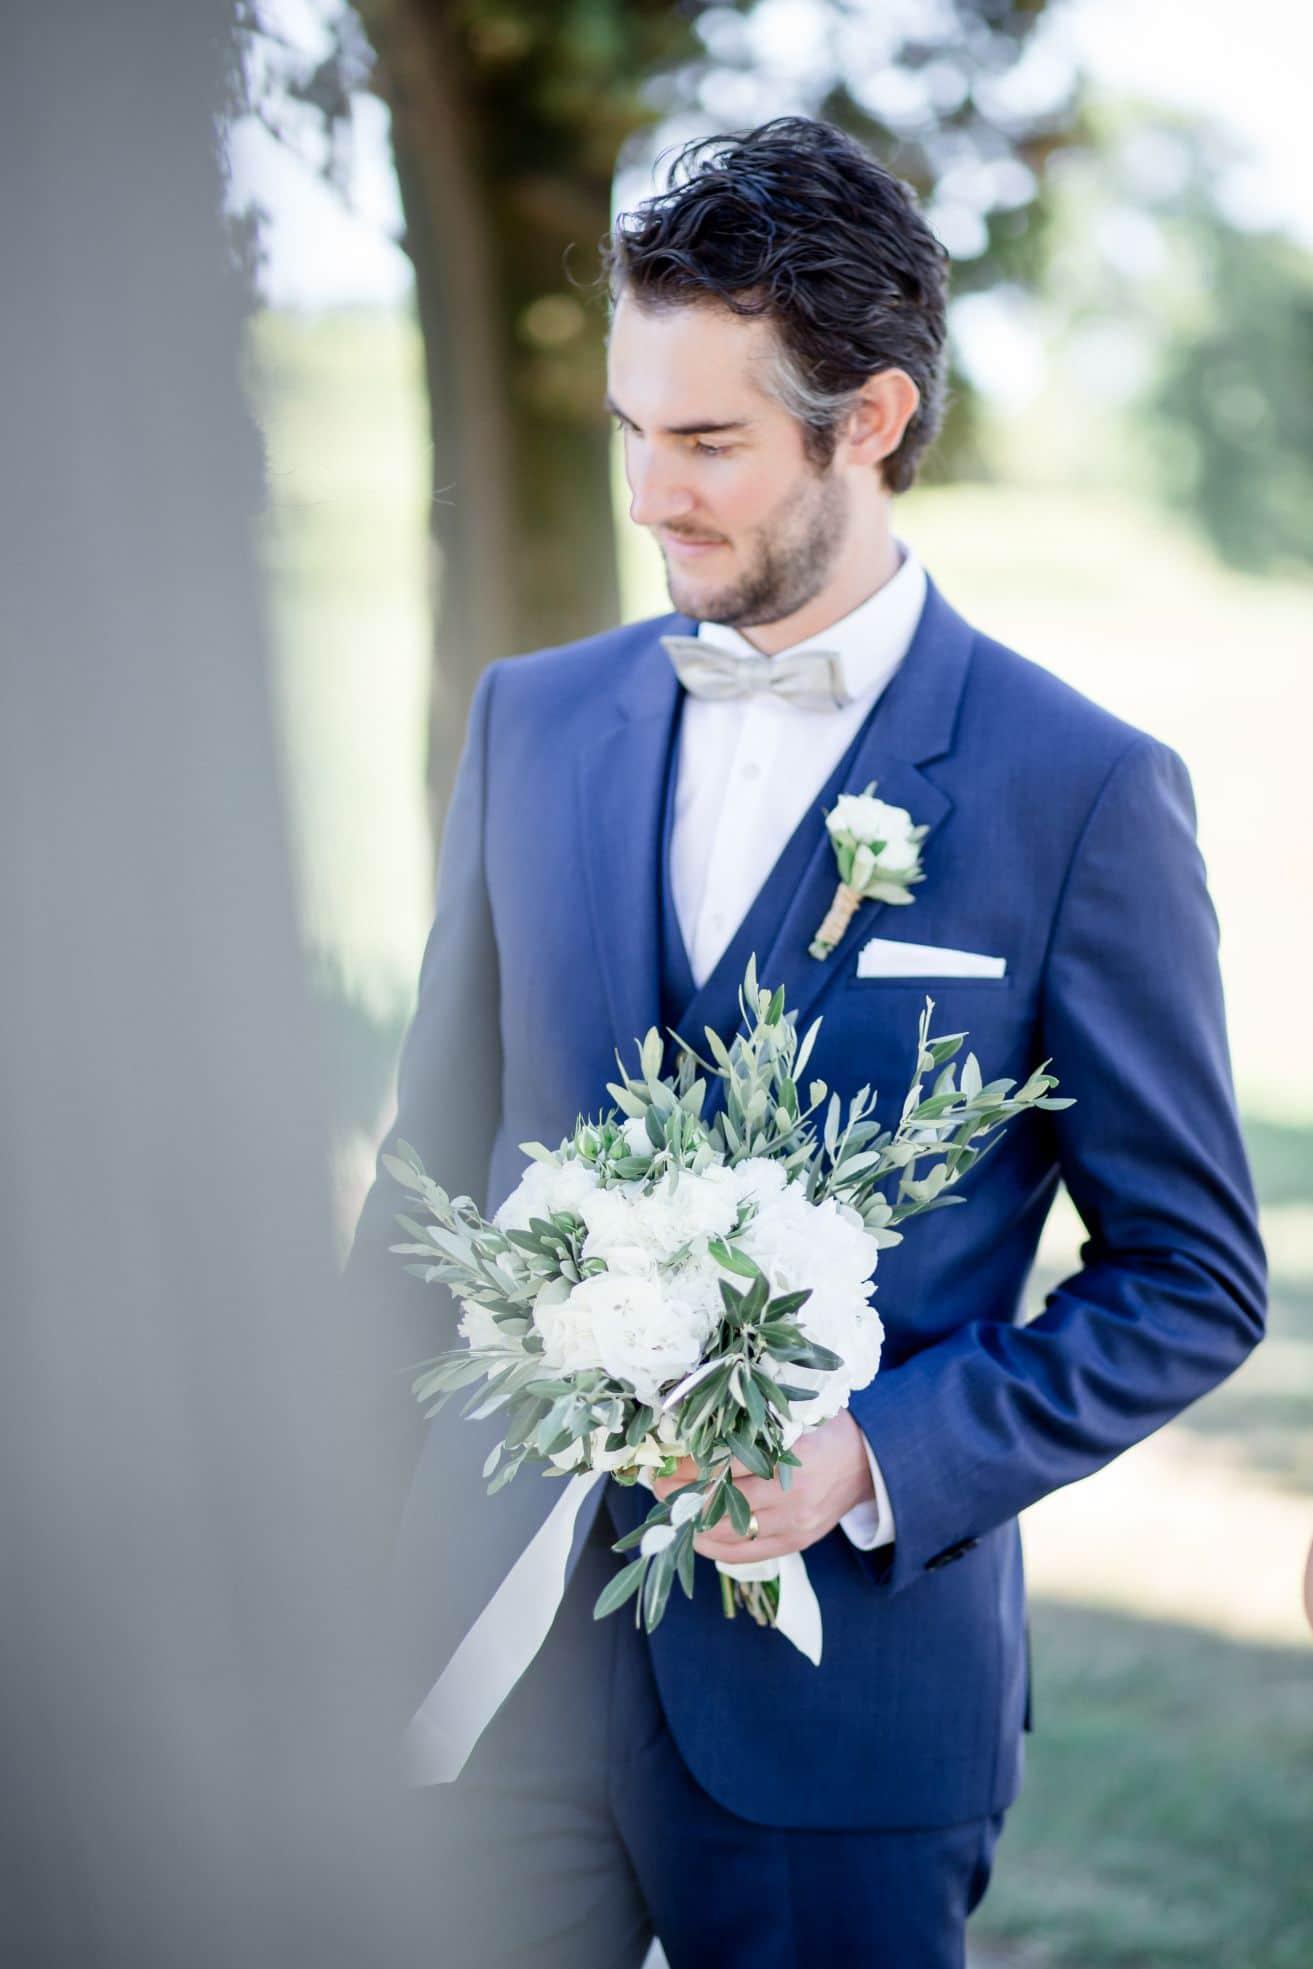 Million Memories_A&D_Hochzeitsfotograf_Schlosshochzeit_Toskana_Lago Di Como_Wedding_Tuscany_100